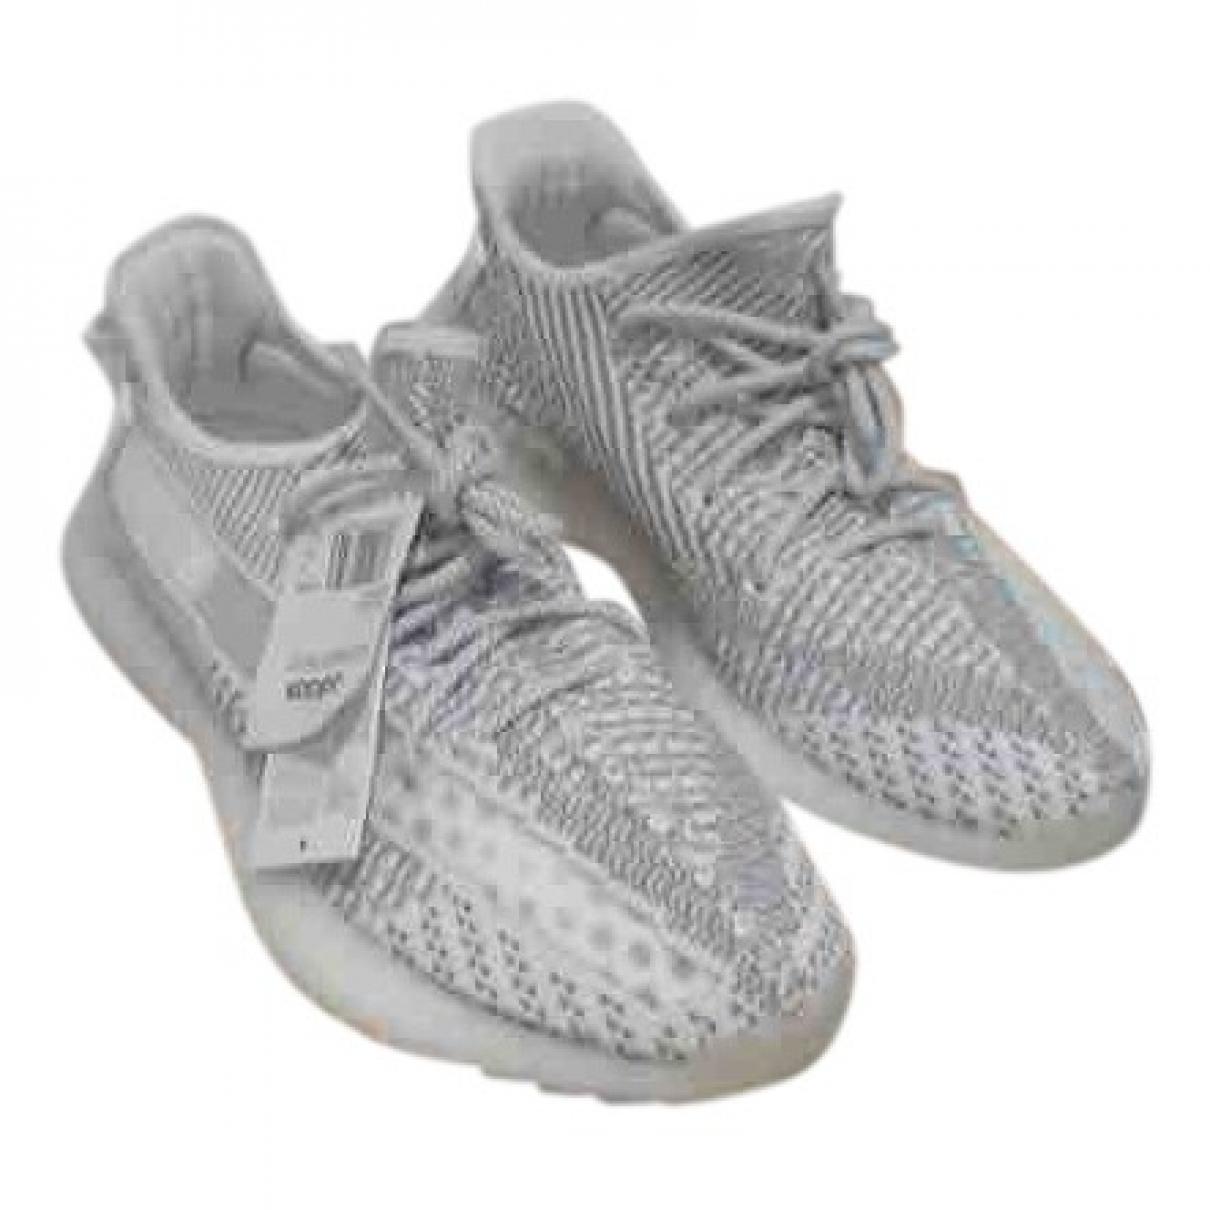 Yeezy X Adidas Boost 350 V2 Sneakers in  Weiss Leinen